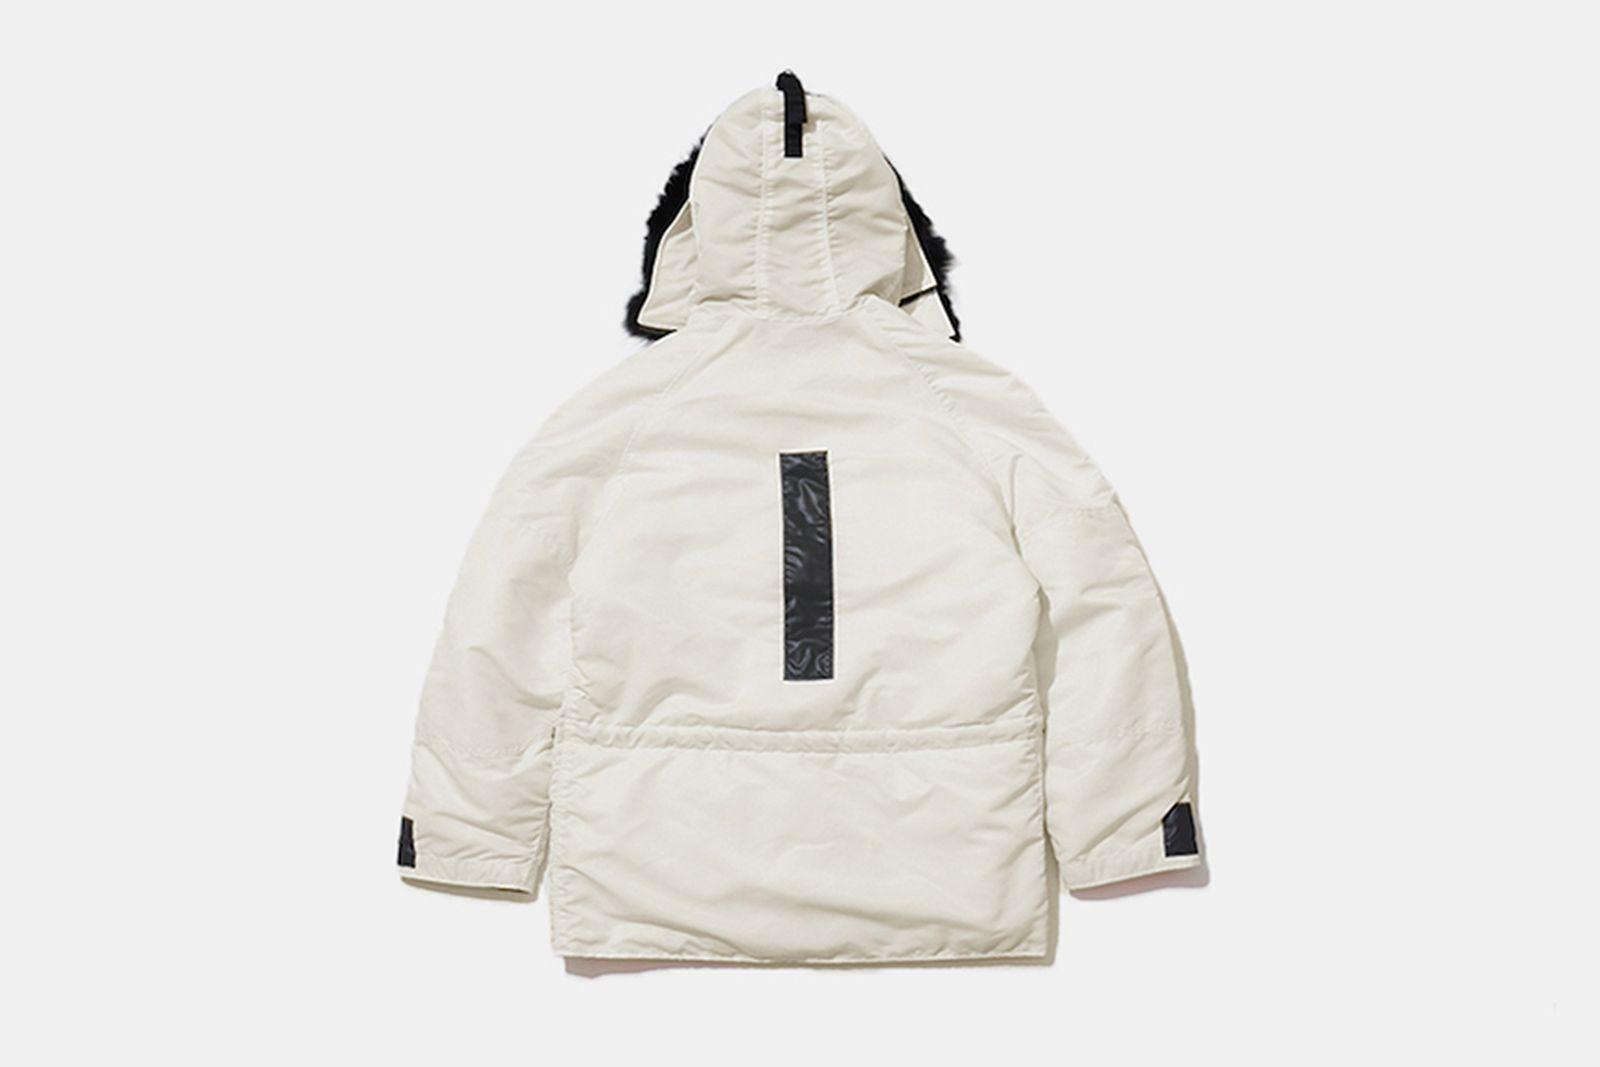 tr 4 suspension buzz ricksons journal standard n 3b jacket tr.4 suspension